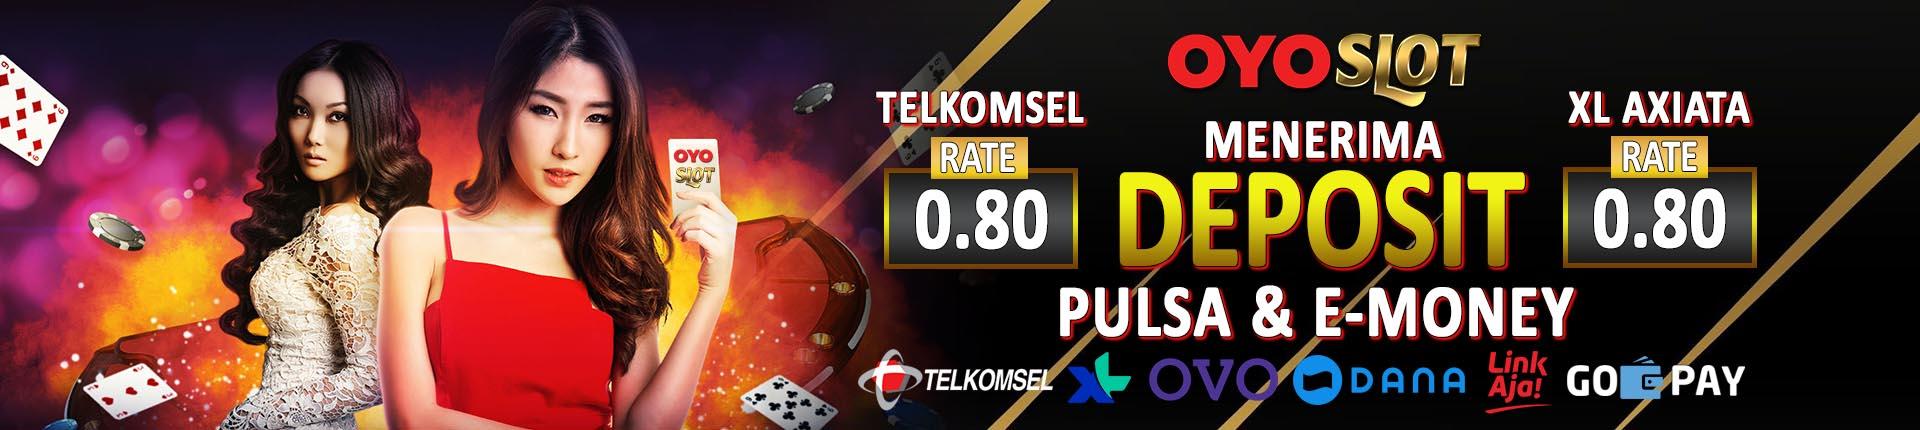 Slot Online Sultan Play Indonesia Terpercaya – Profile – Full Press  Coverage Forum